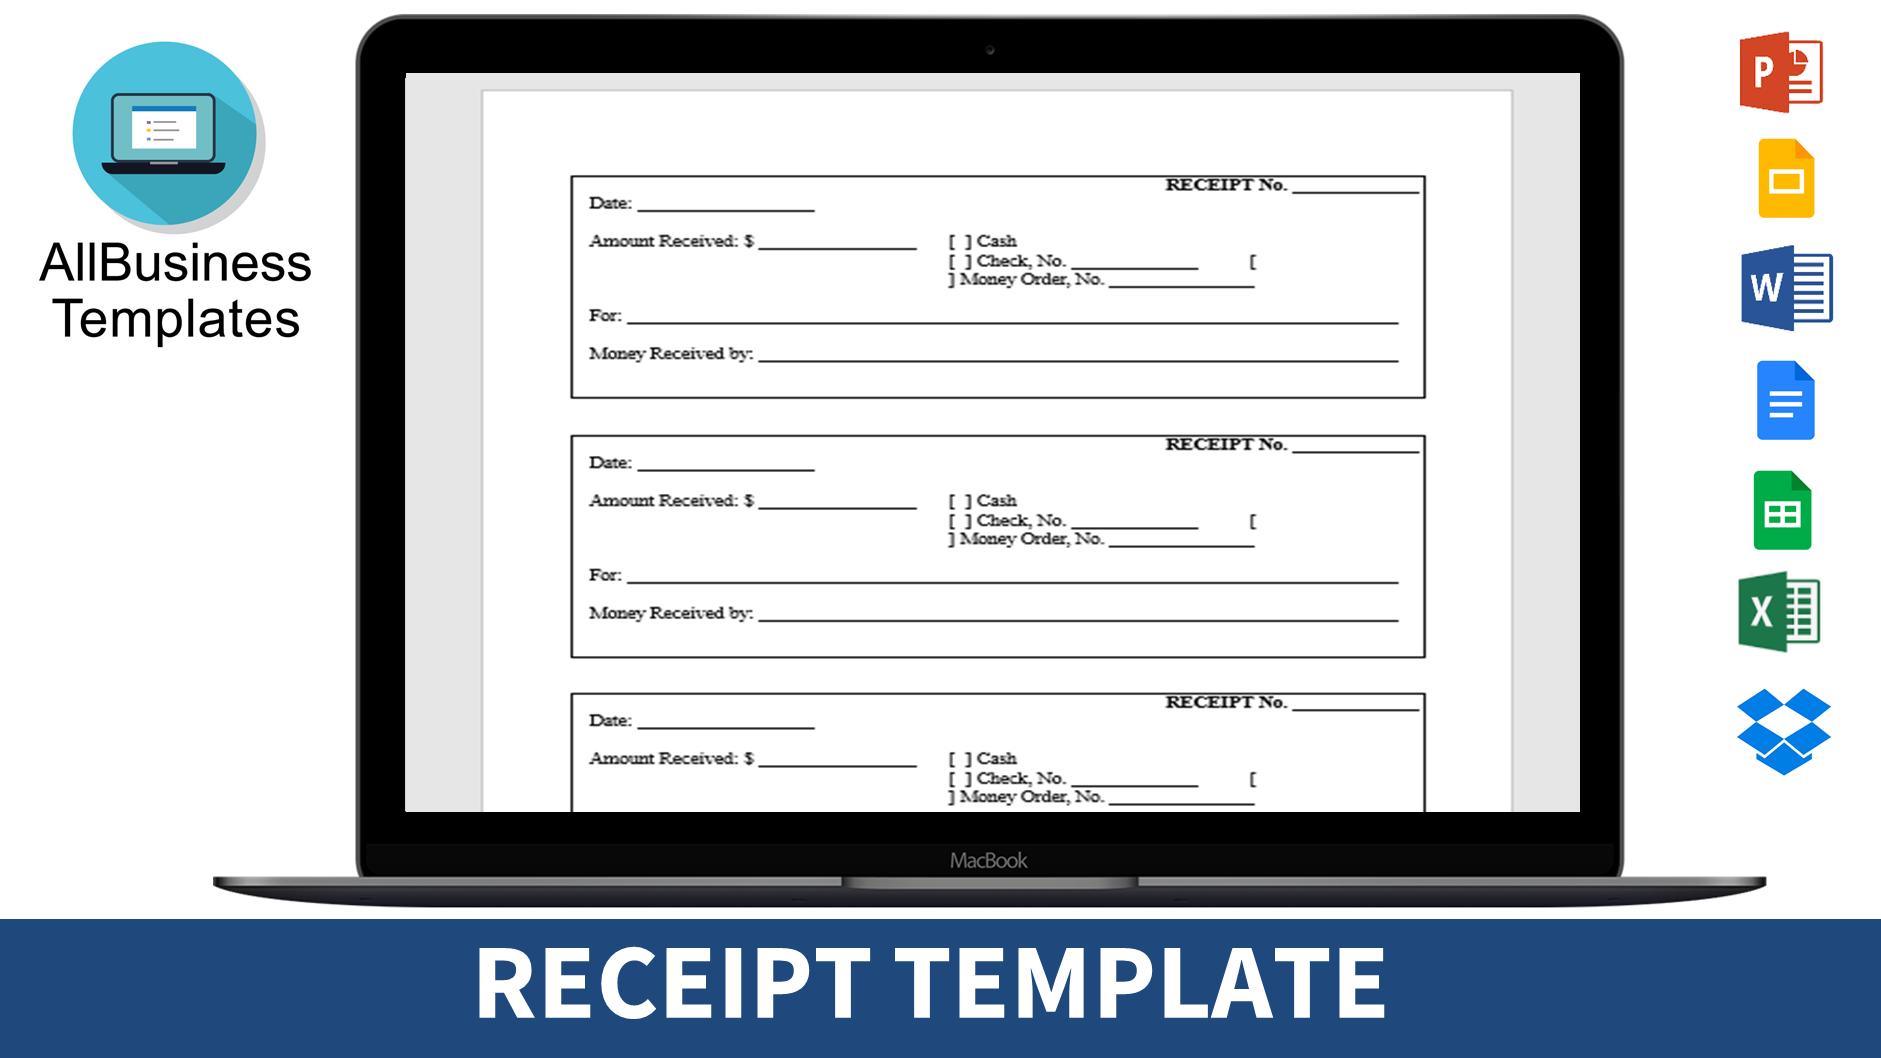 Printable Receipt Templates At Allbusinesstemplates Com